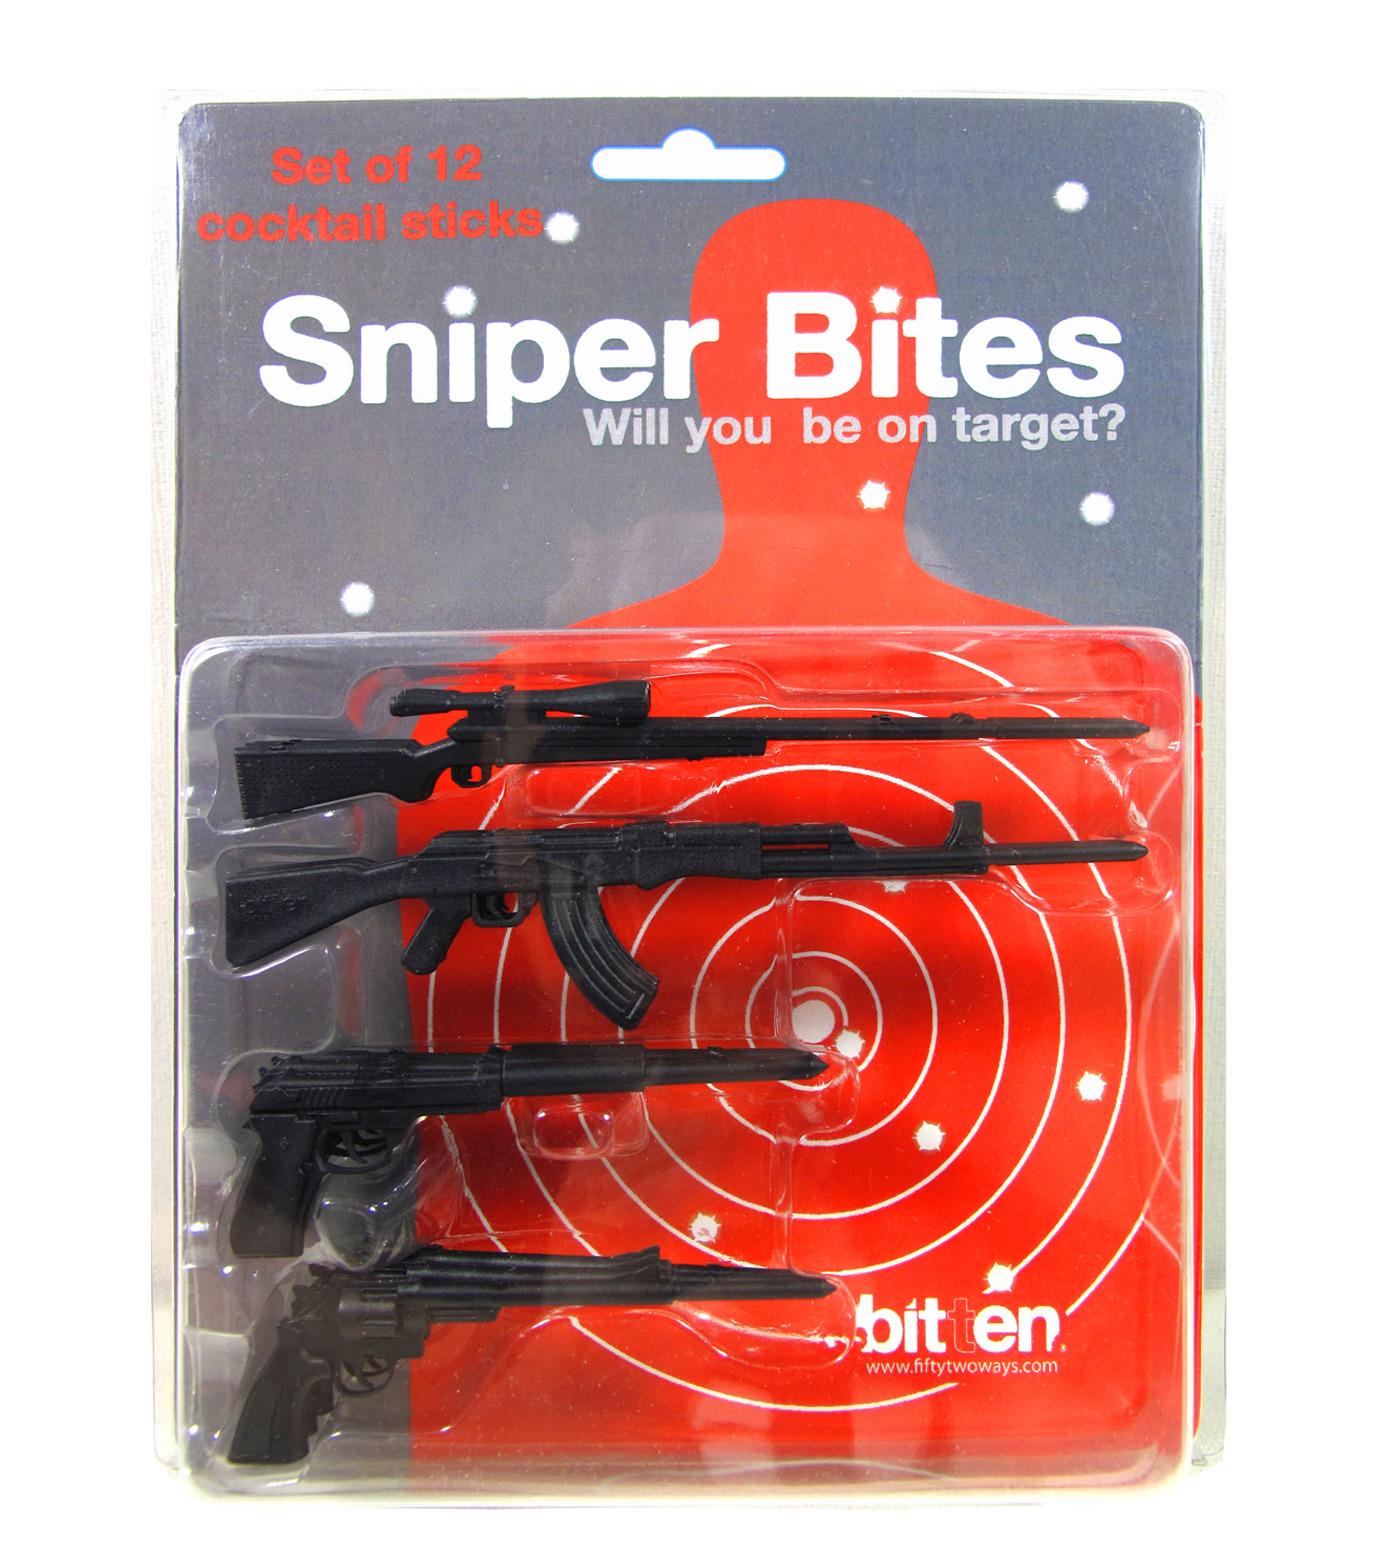 nuop design(ヌオップデザイン)のSniper Bites-Plastic-BLACK(OTHER-GOODS/OTHER-GOODS)-SB1-13 拡大詳細画像1